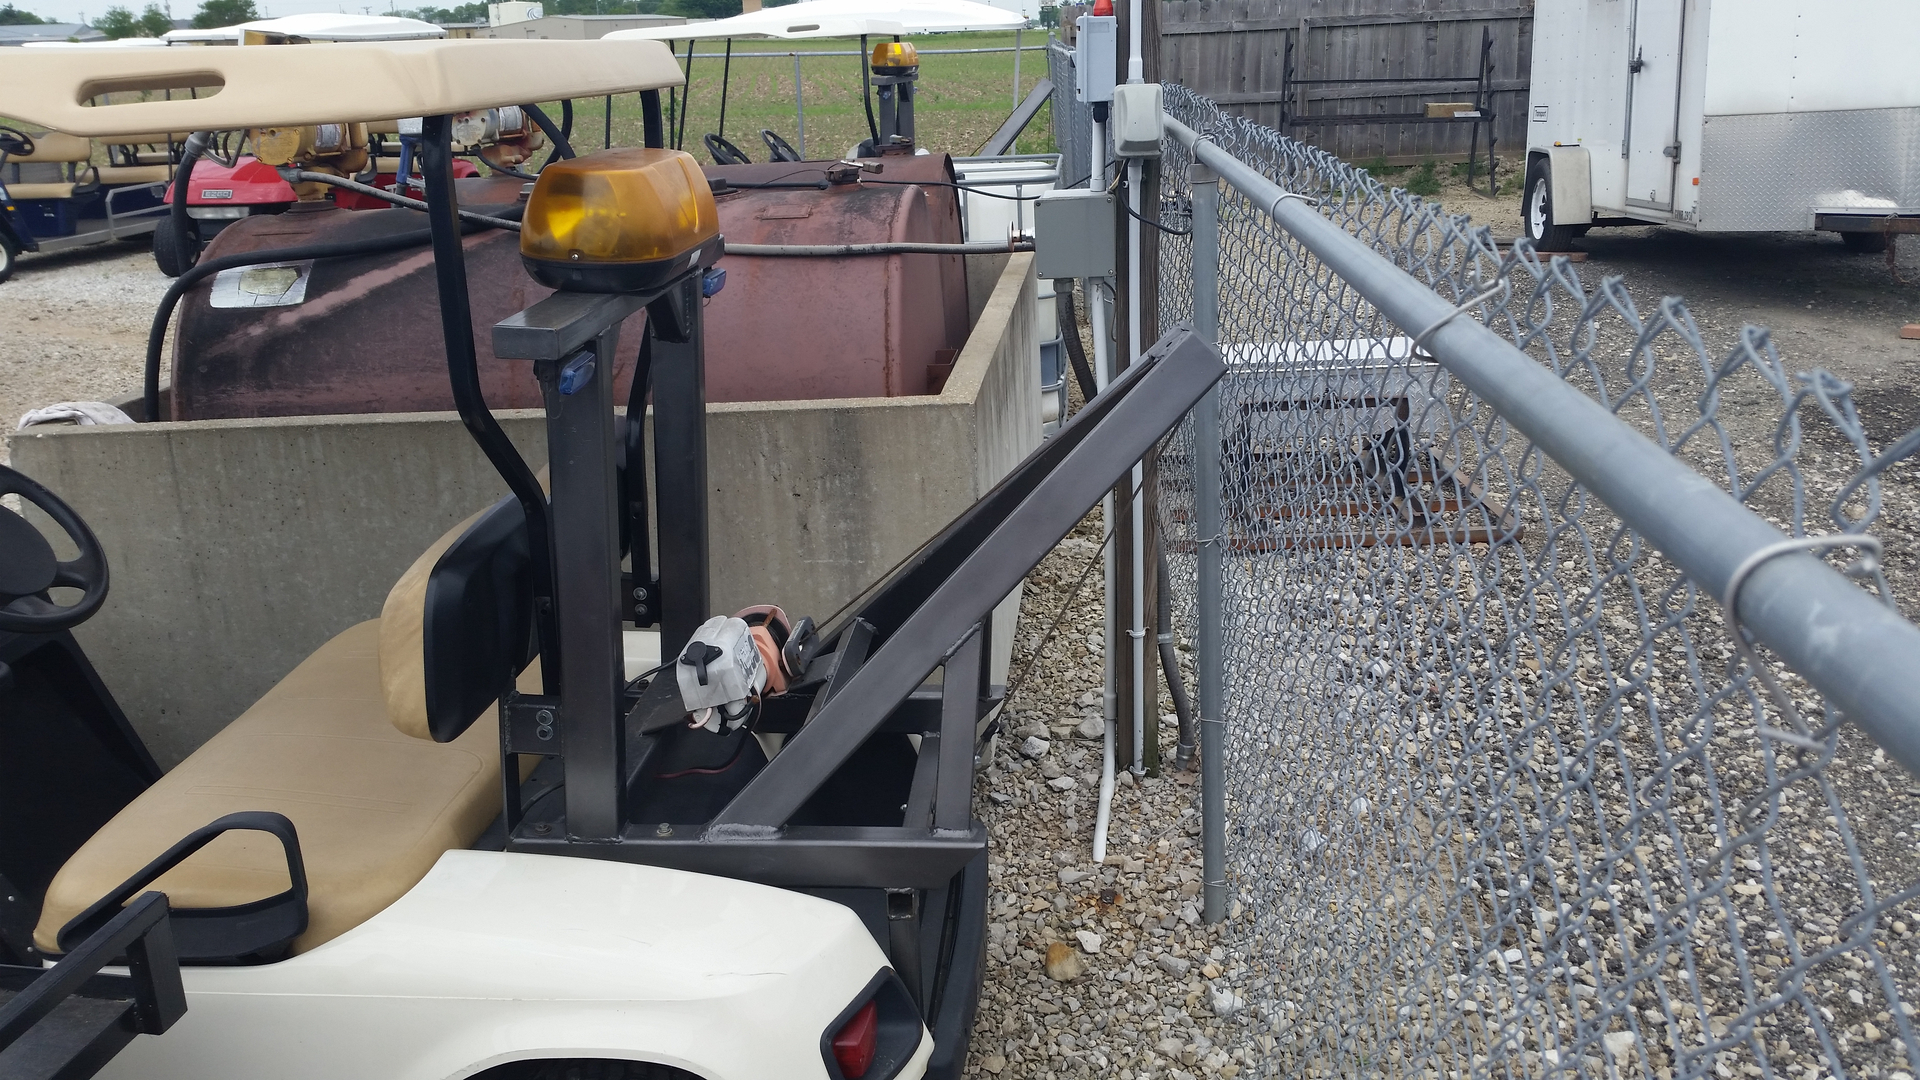 Customizing Truck Golf Cart With Doors Html on